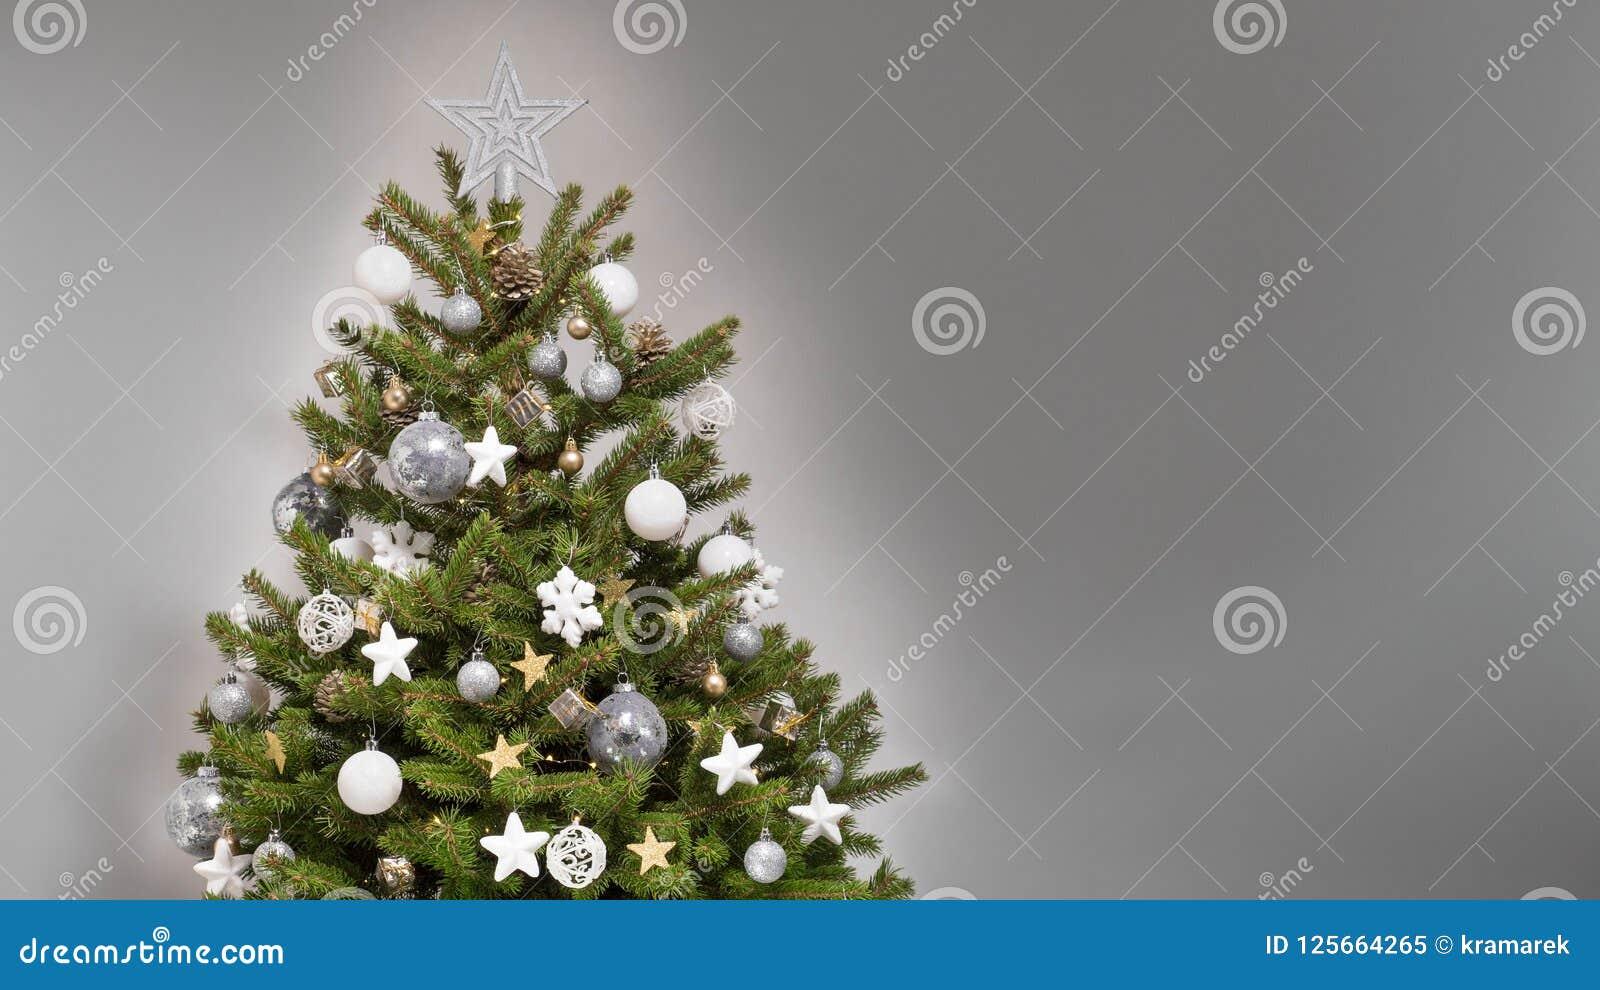 White And Silver Christmas Tree Theme.Design Christmas Tree With White Silver And Golden